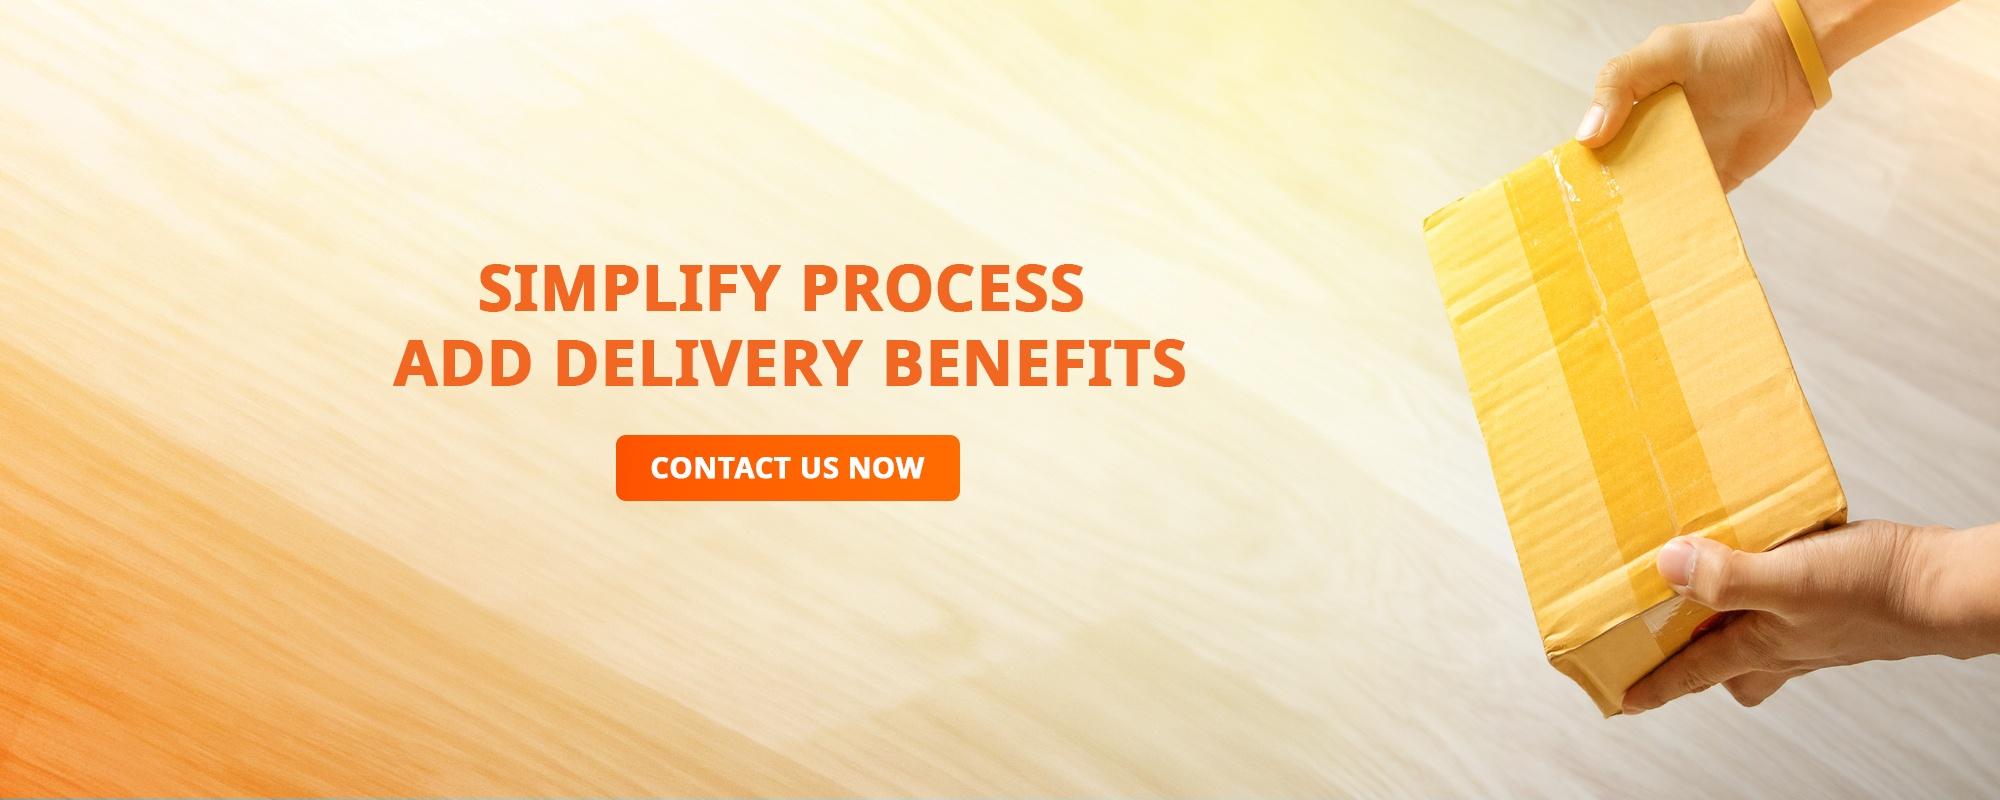 Simplify Process Lalamove